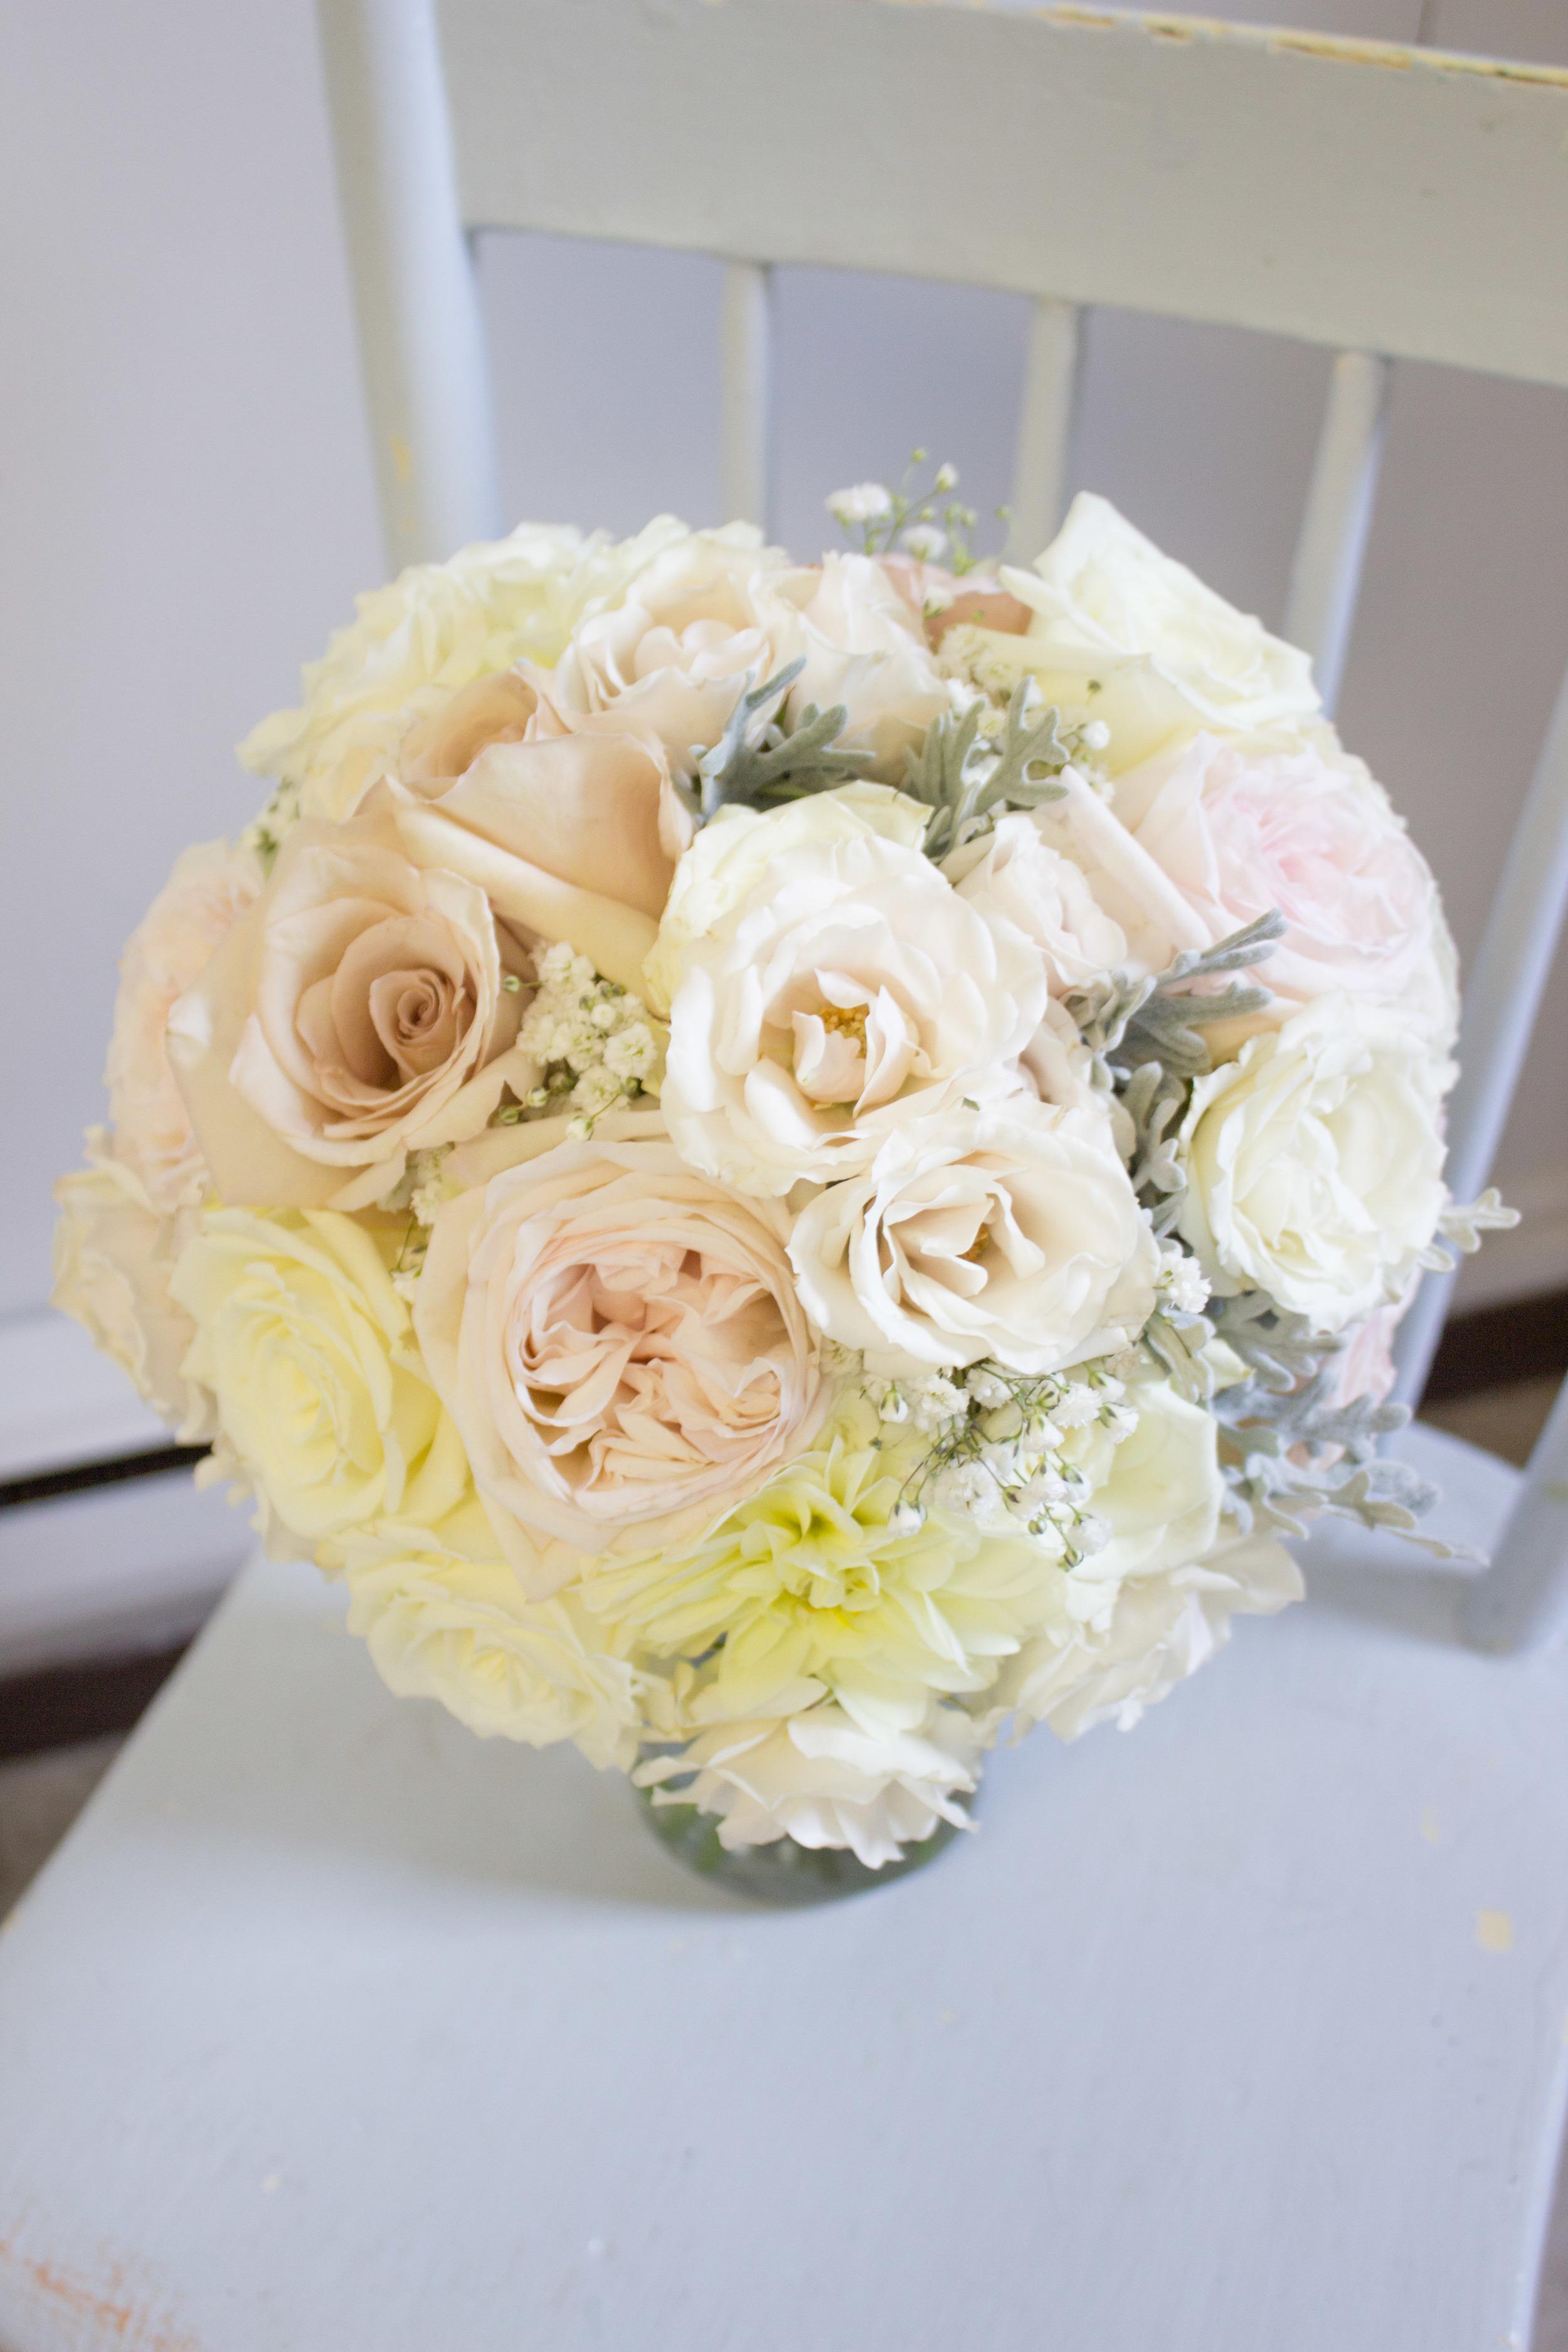 Brides Bouquet: Garden roses, dahlias,baby'sbreath, roses, freshly picked dusty miller from my garden!